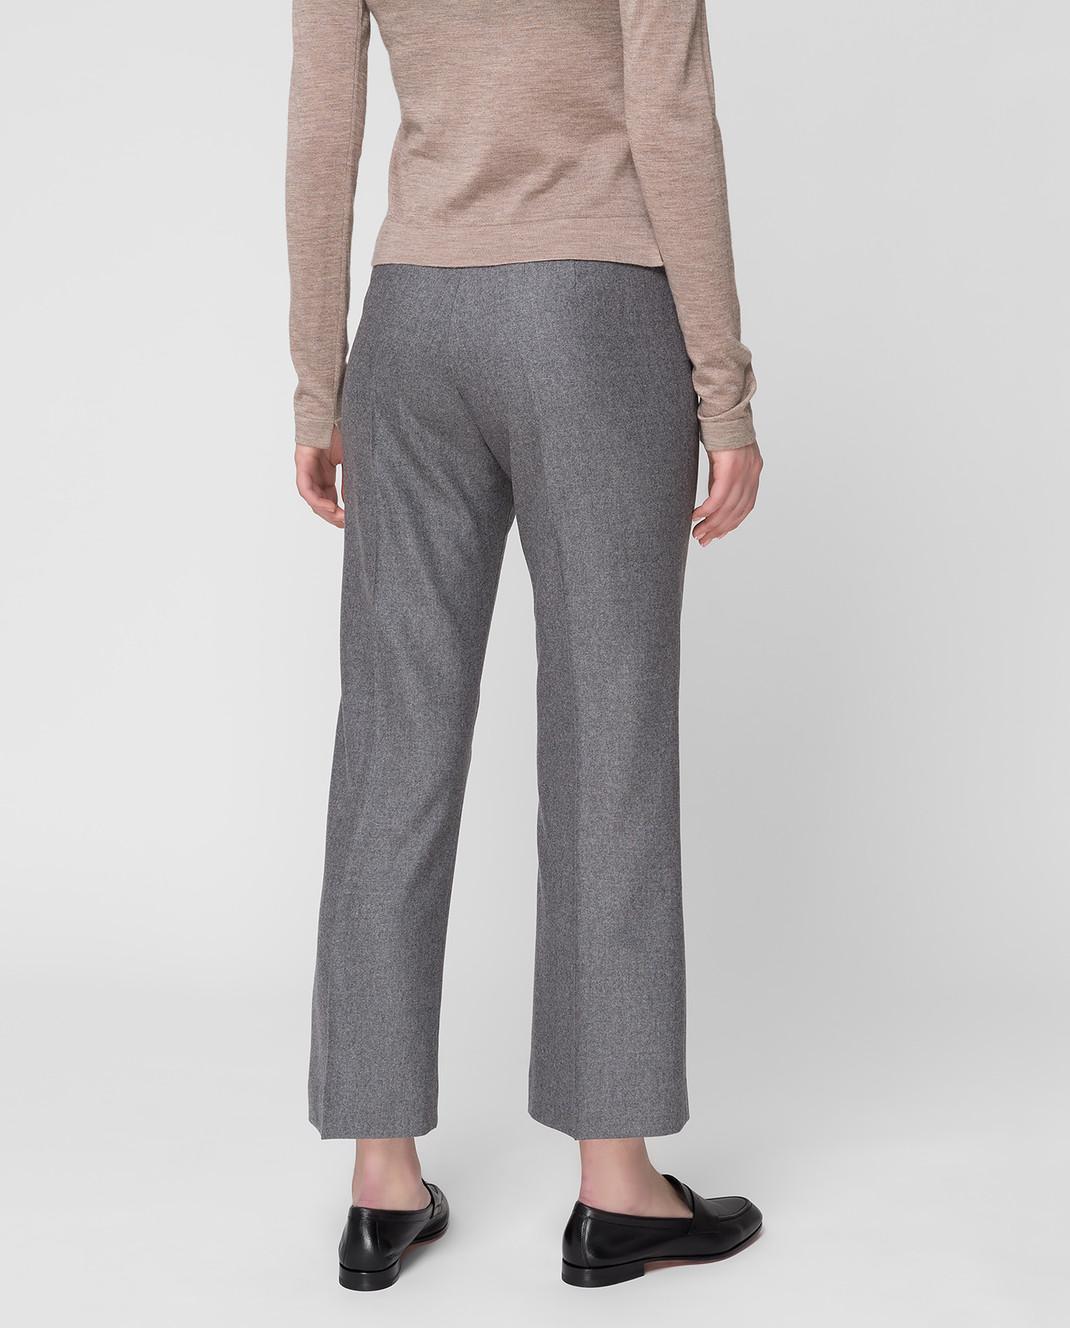 COLOMBO Серые брюки PA0032661088 изображение 4